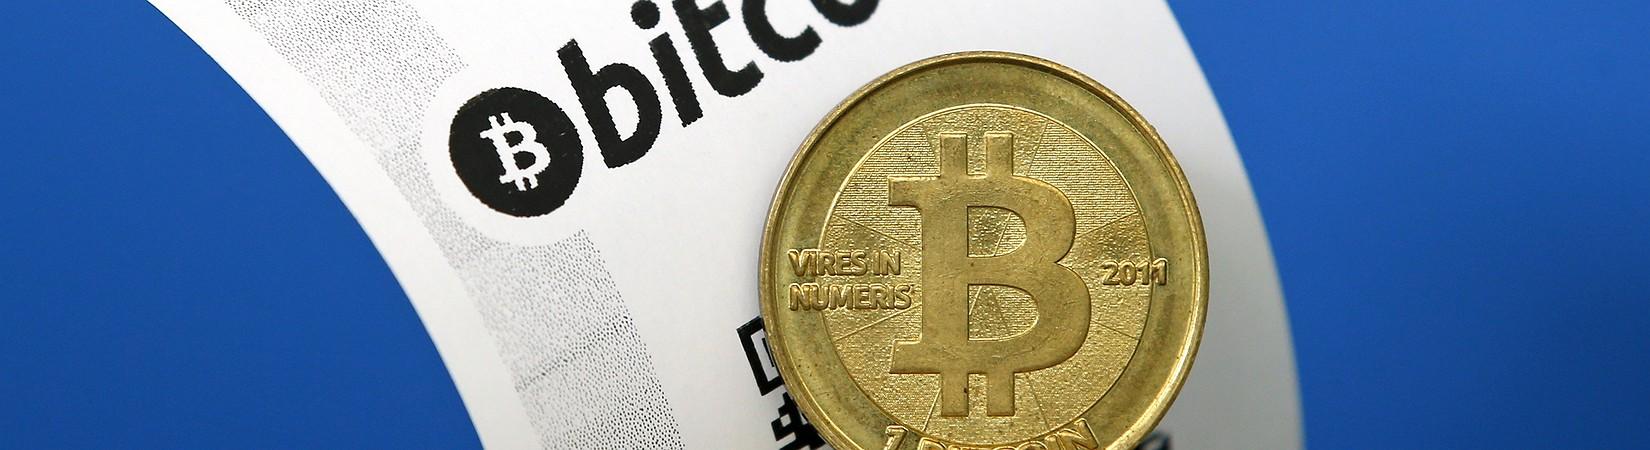 Bitcoin soars on legalisation in Japan